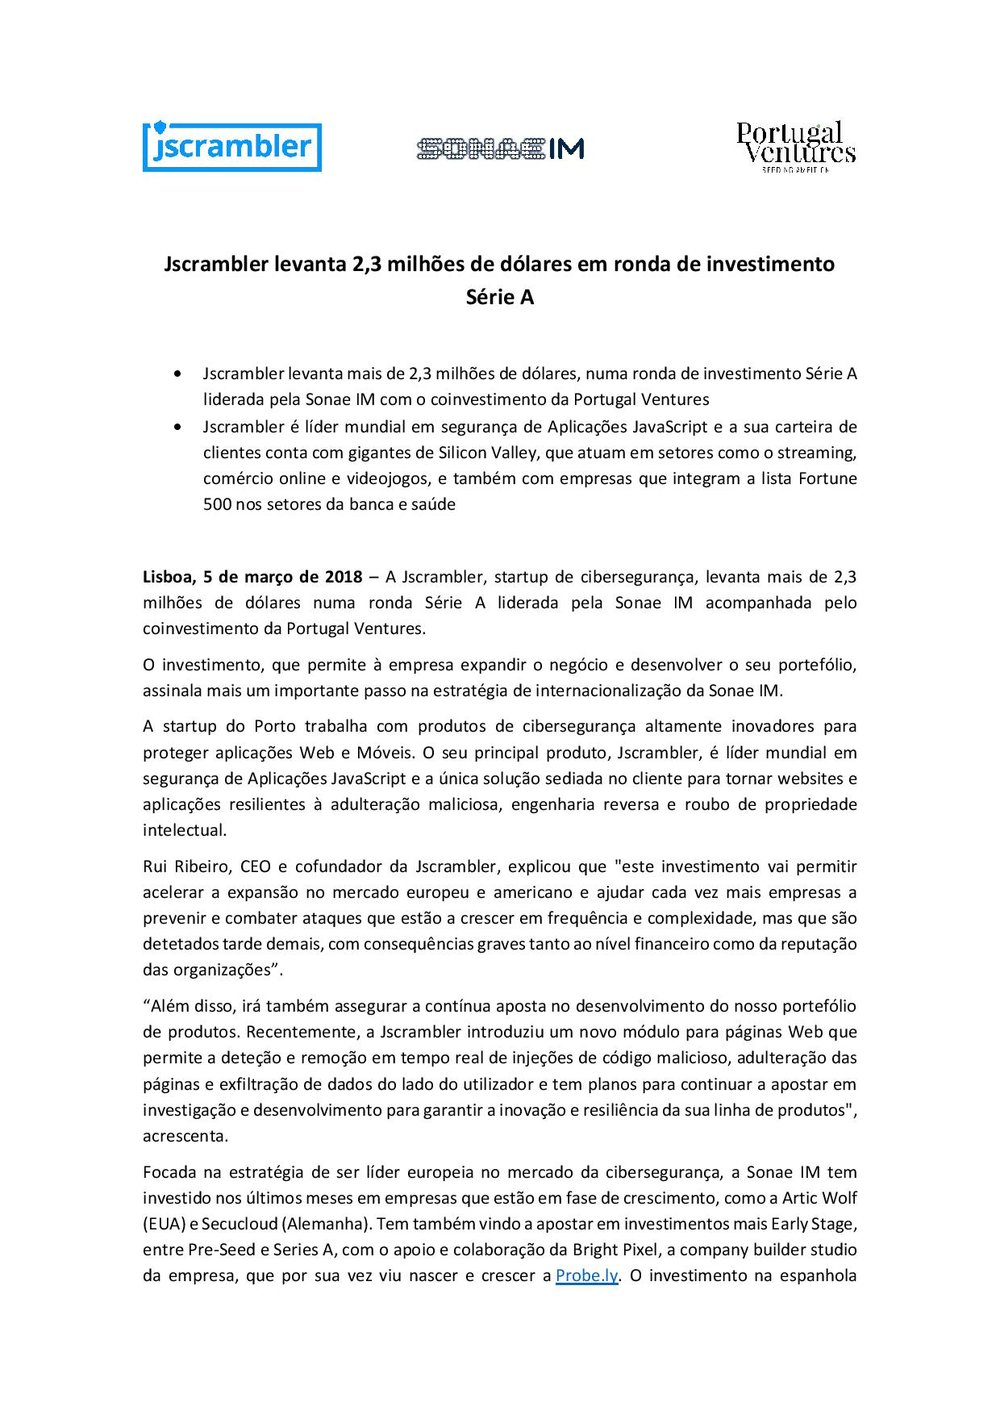 [PT] Jscrambler - PR Investimento Sonae IM-page-001.jpg